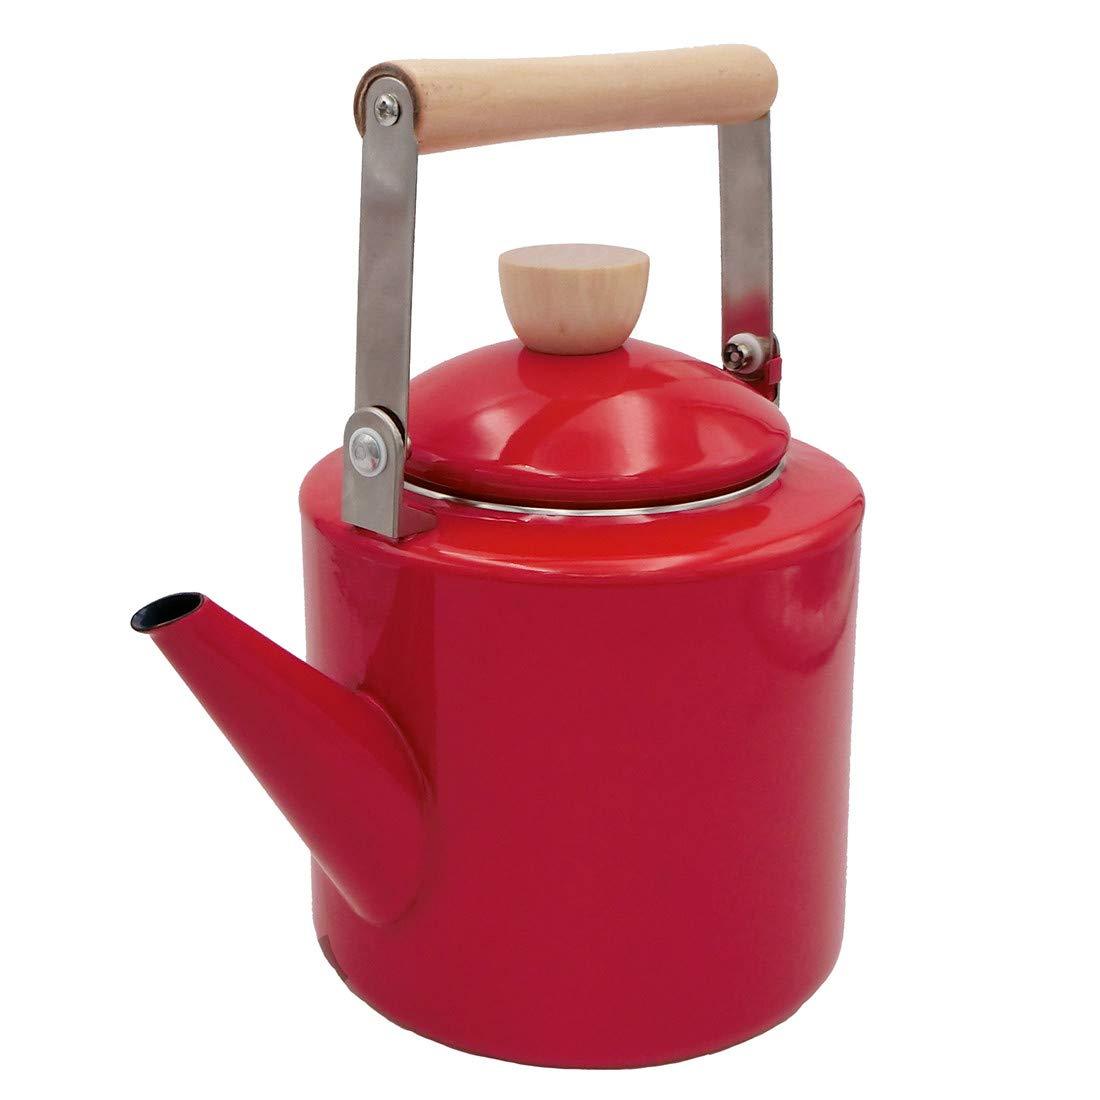 Keypro Enamel on Steel Tea Kettle, 2.1-Quart Maximum Capacity, Cylindrical Shape with Wood Handle, Vintage Style(Red)